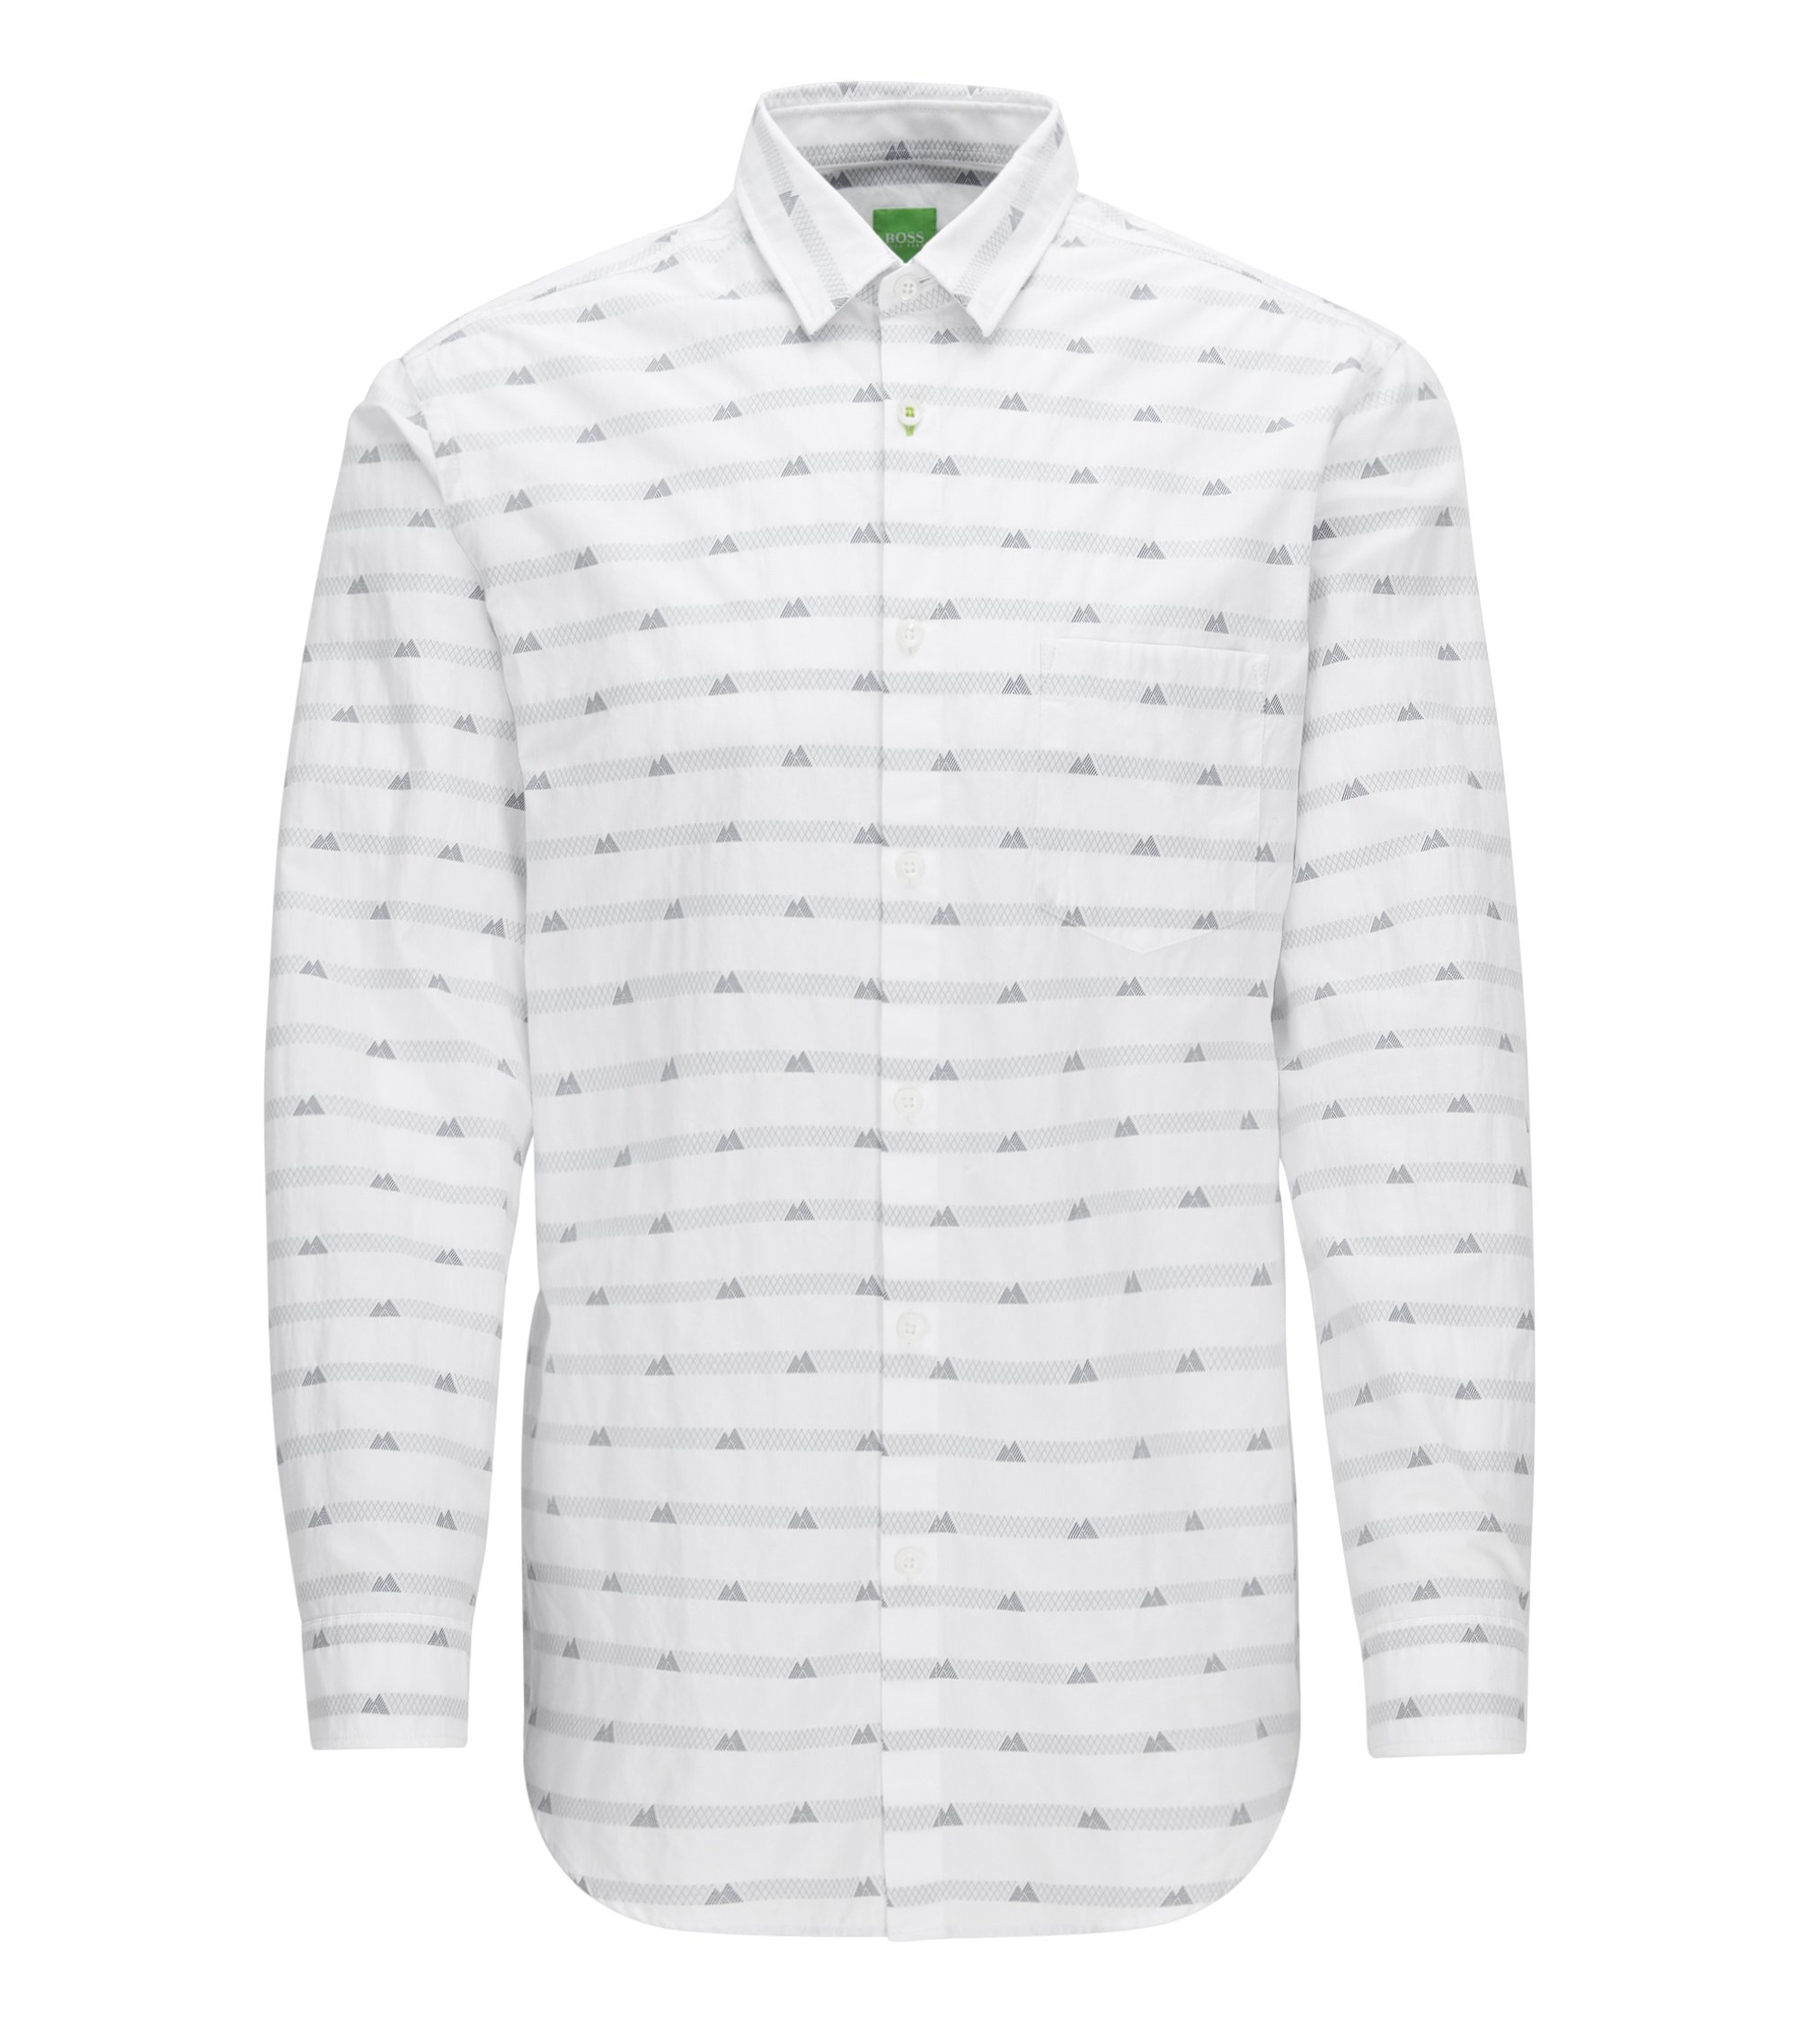 'Baul' | Regular Fit, Mountain-Print Cotton Button Down Shirt, White